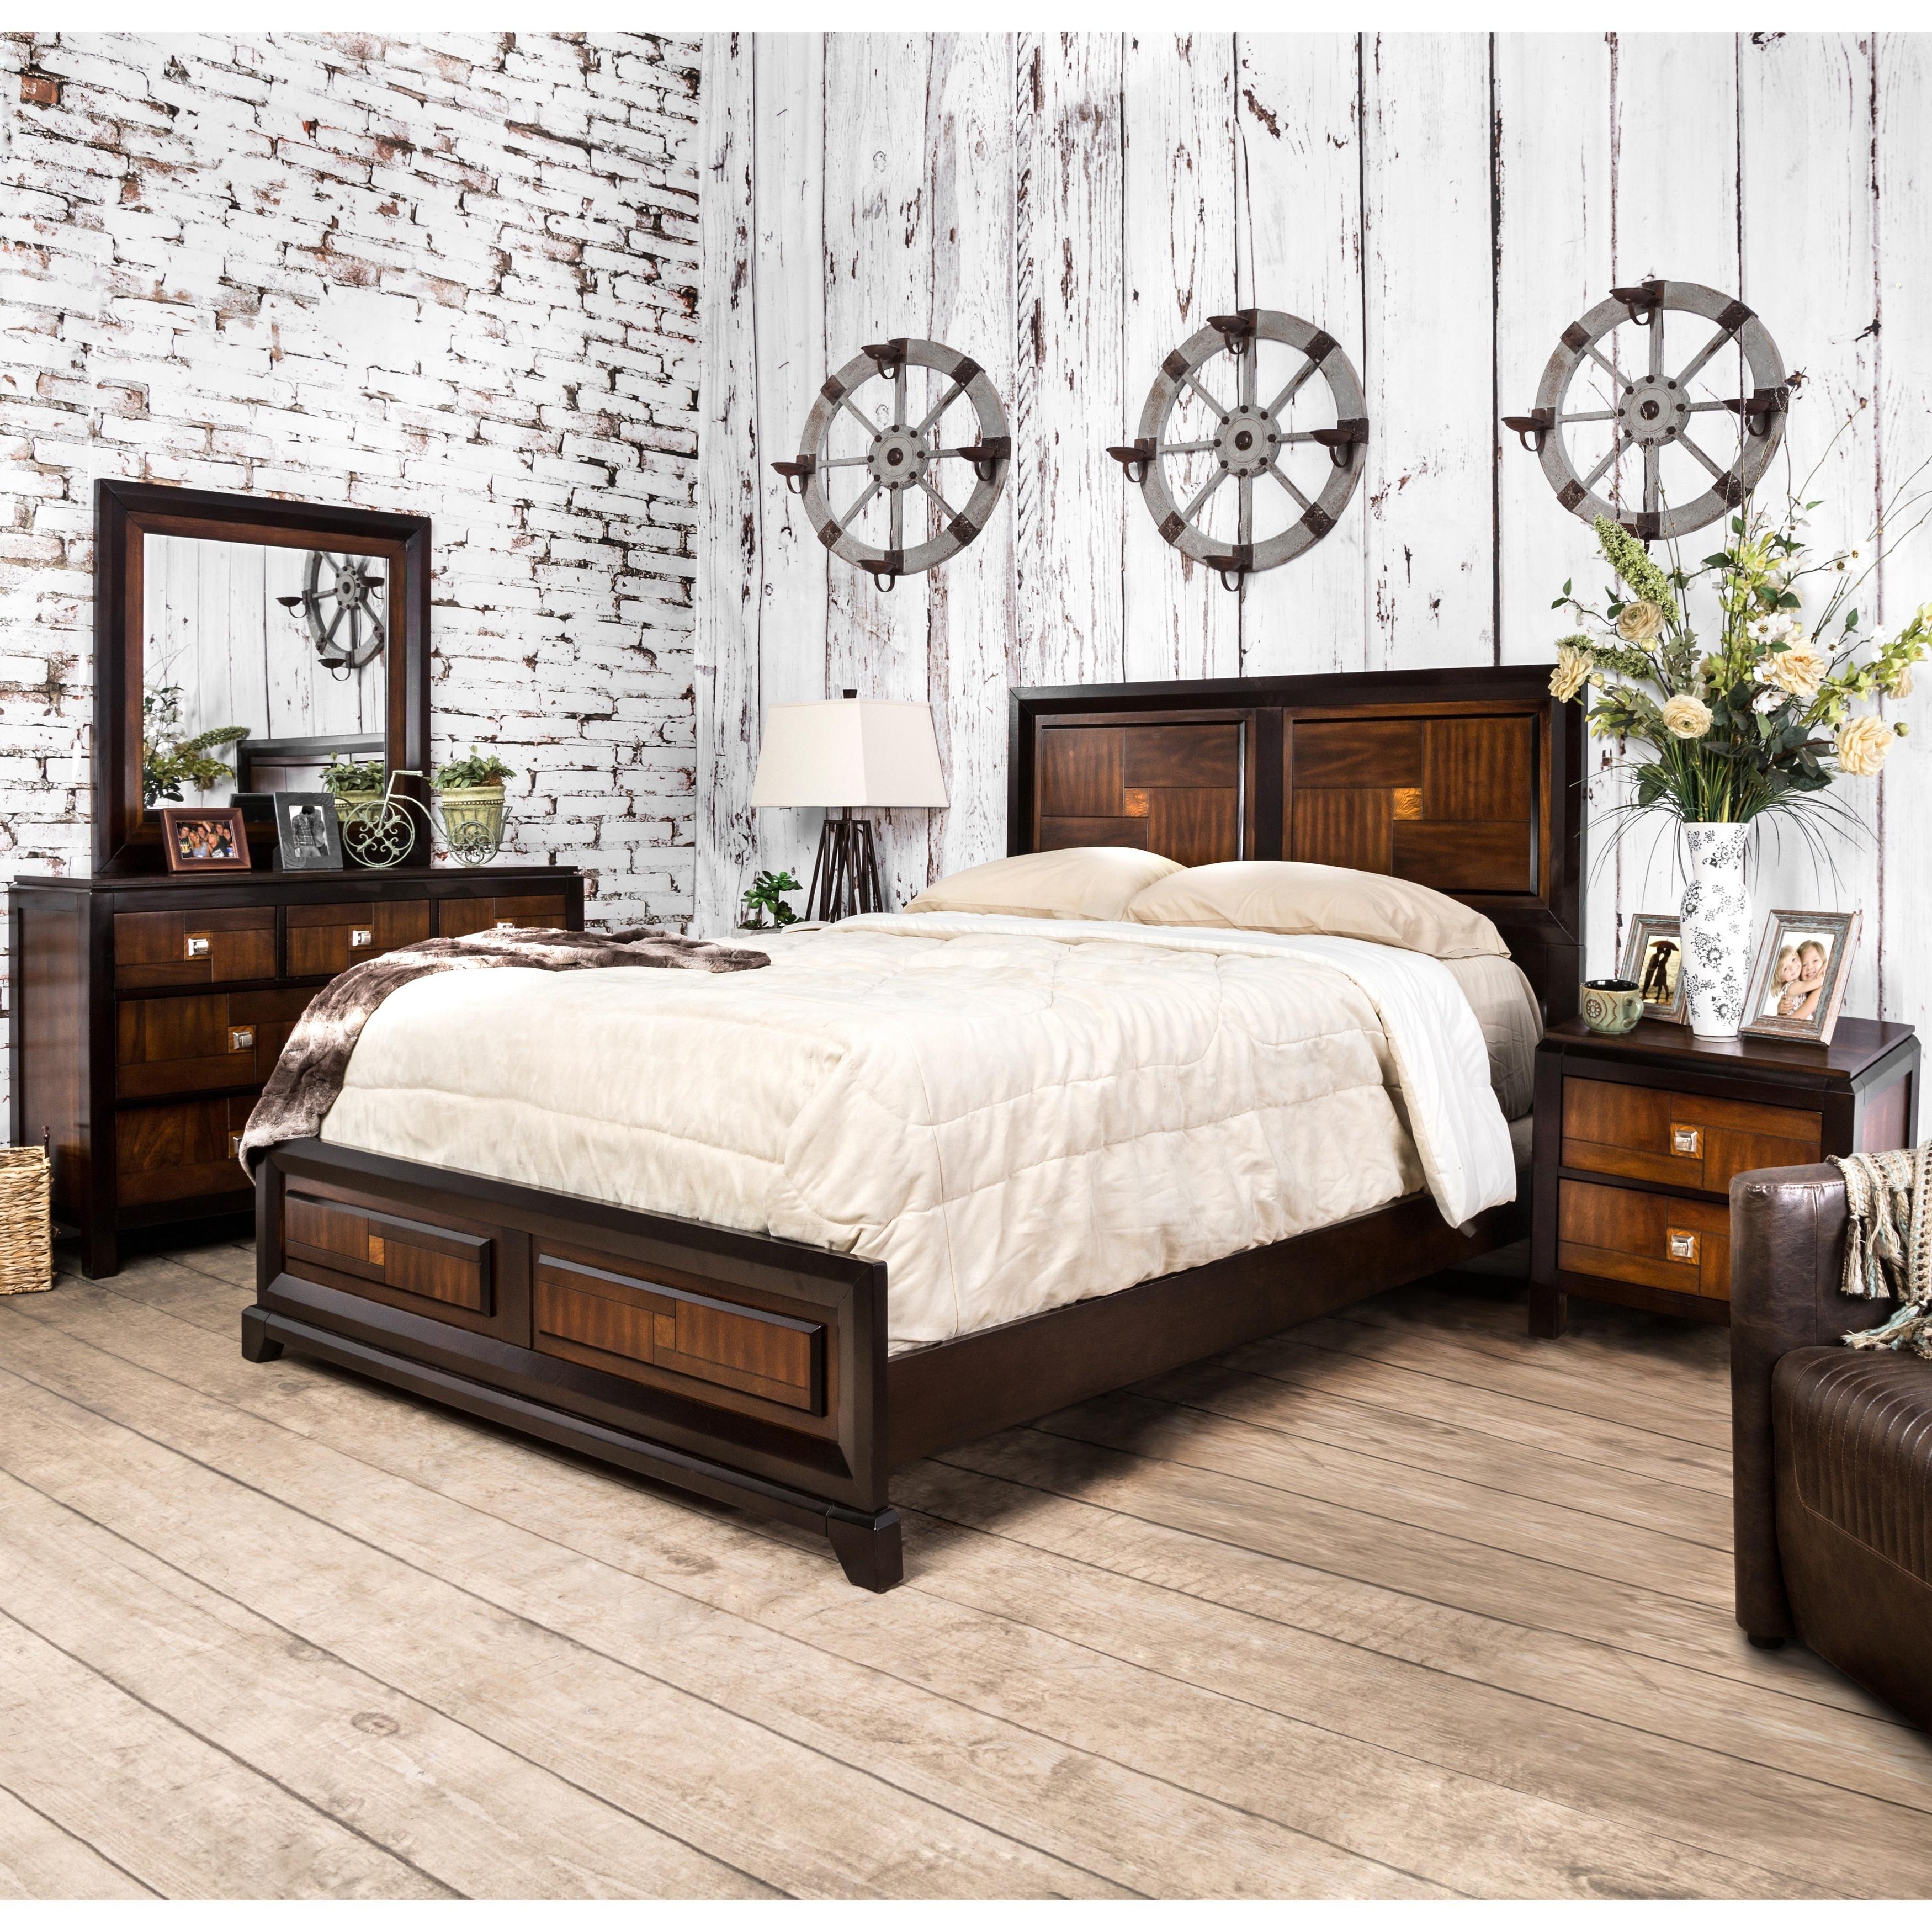 Duo-tone Contemporary Walnut 4-Piece Bedroom Set by FOA